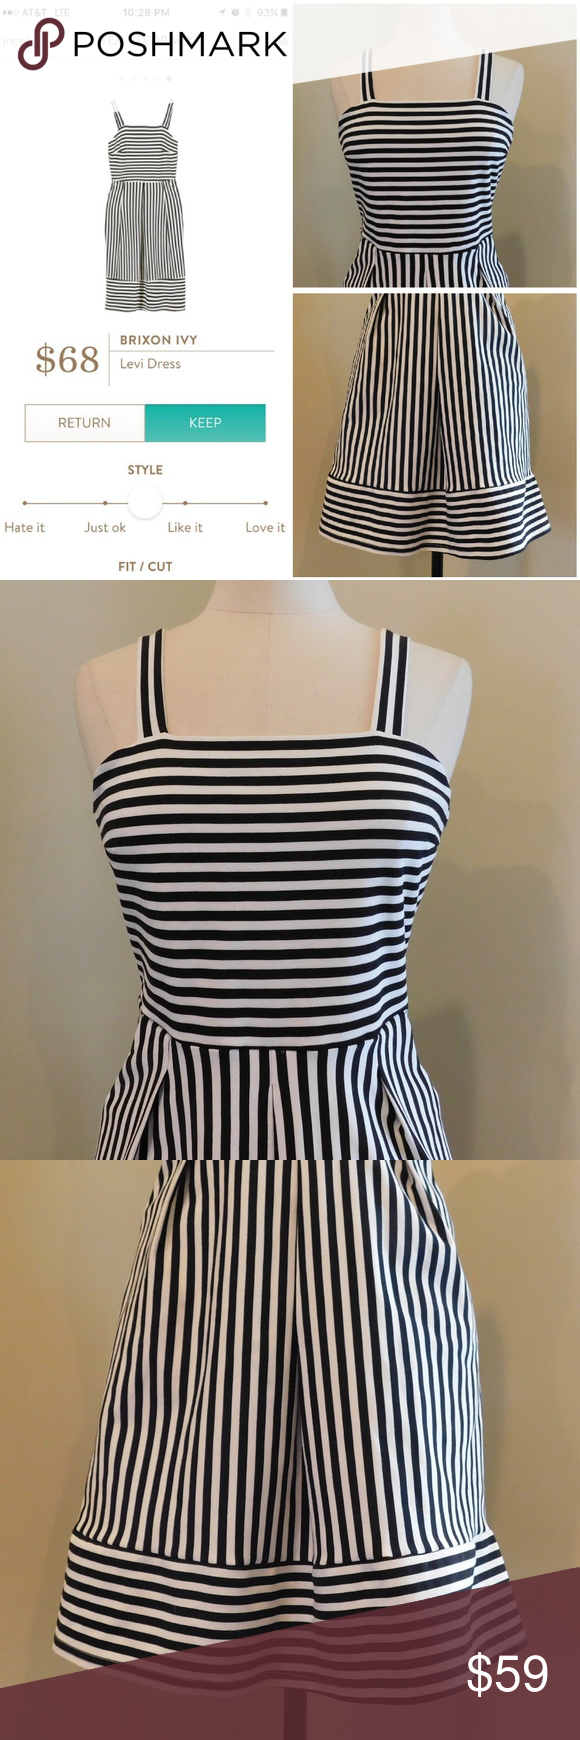 5635a1175dd BRIXON IVY ~ Medium Levi Dress STITCH FIX Stripe  NO Trades Please   EXCELLENT condition